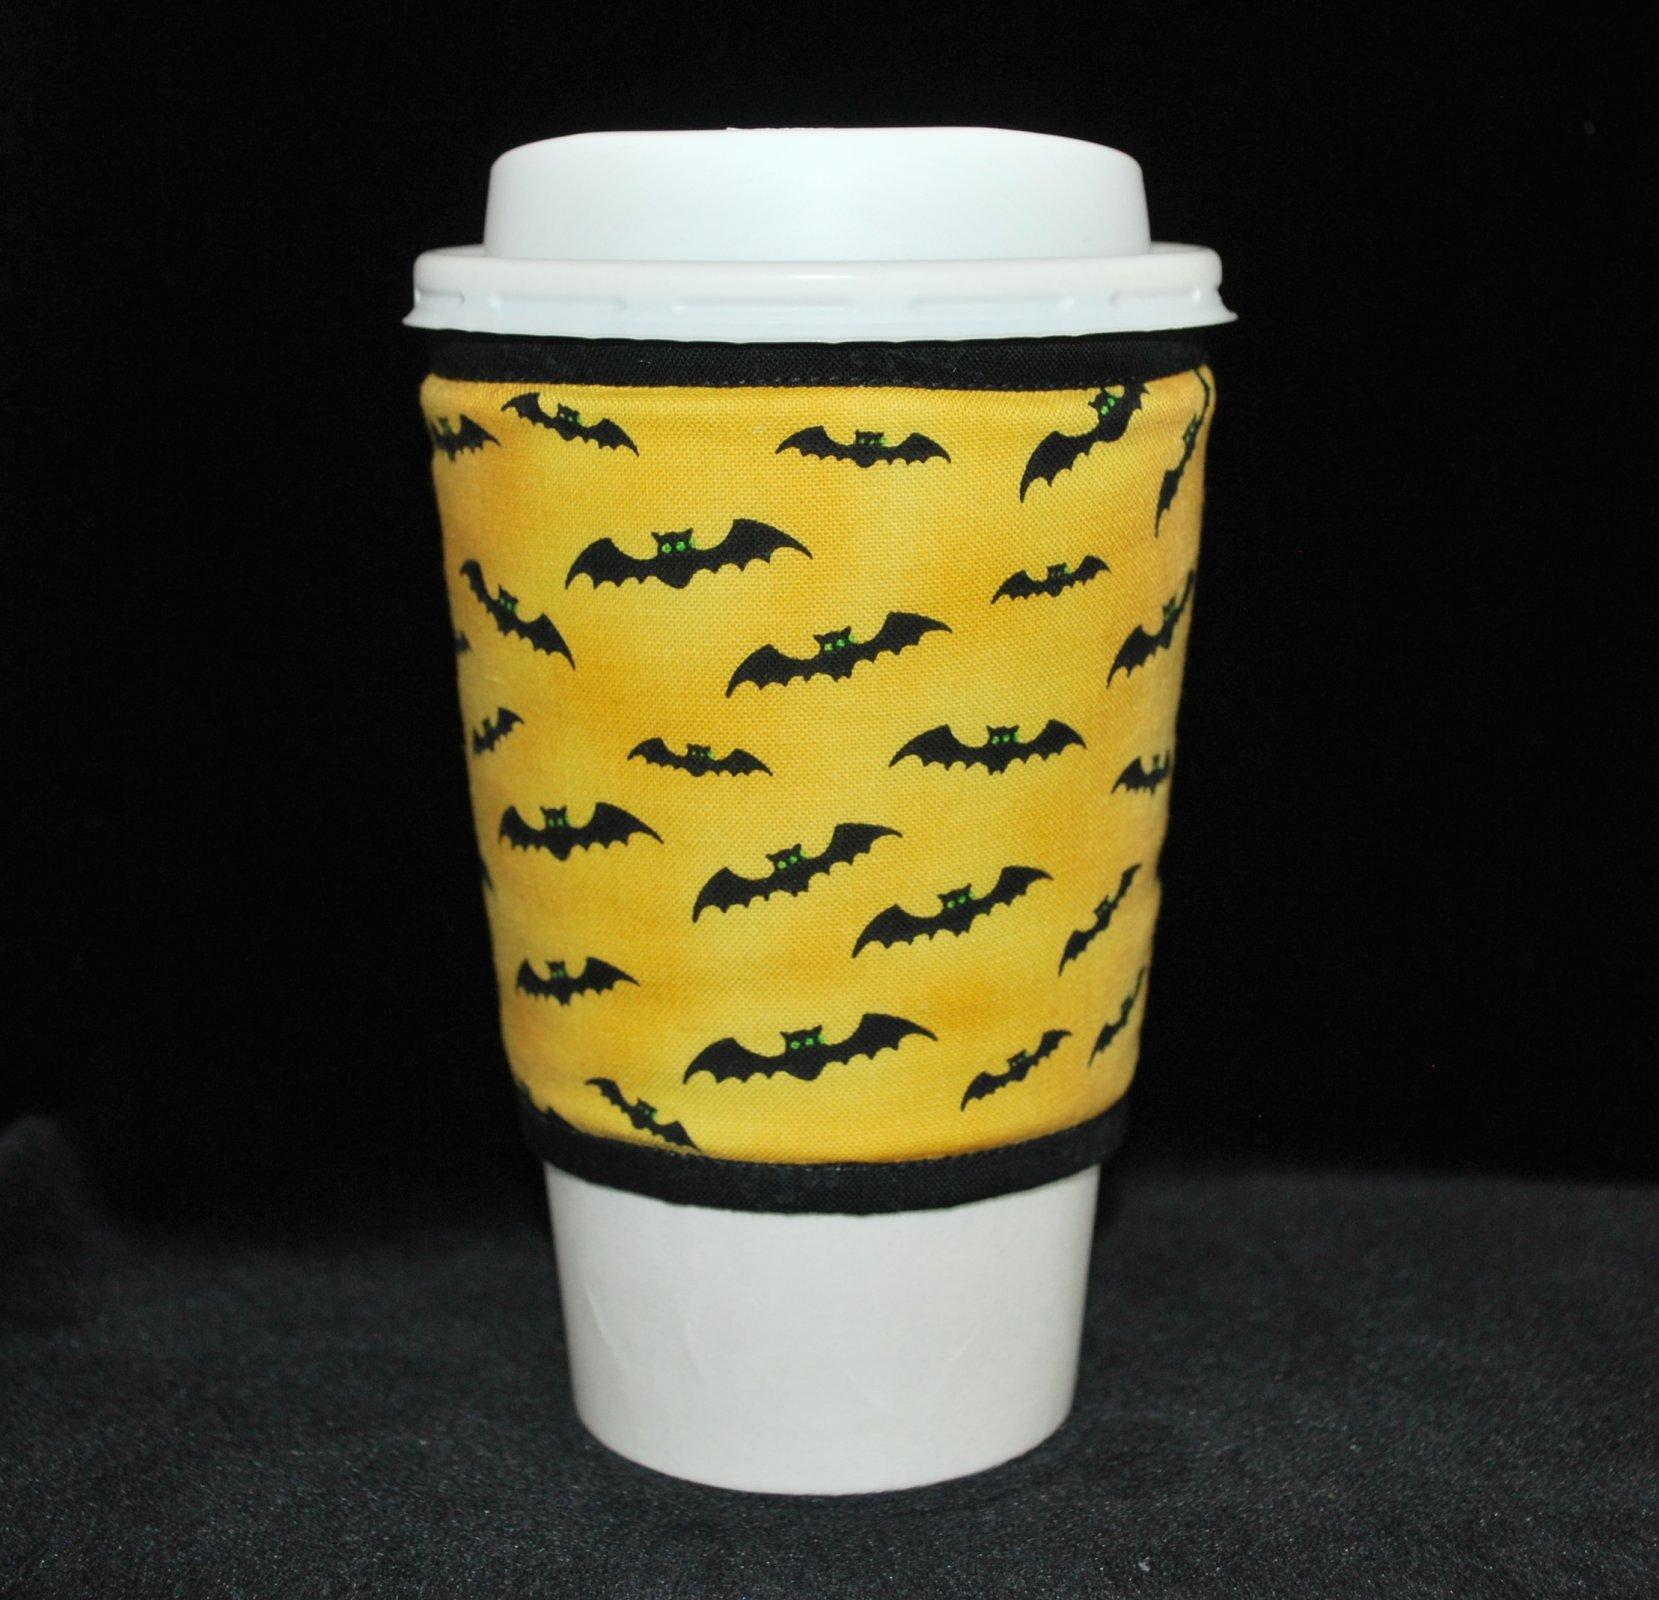 Small black bats on yellow